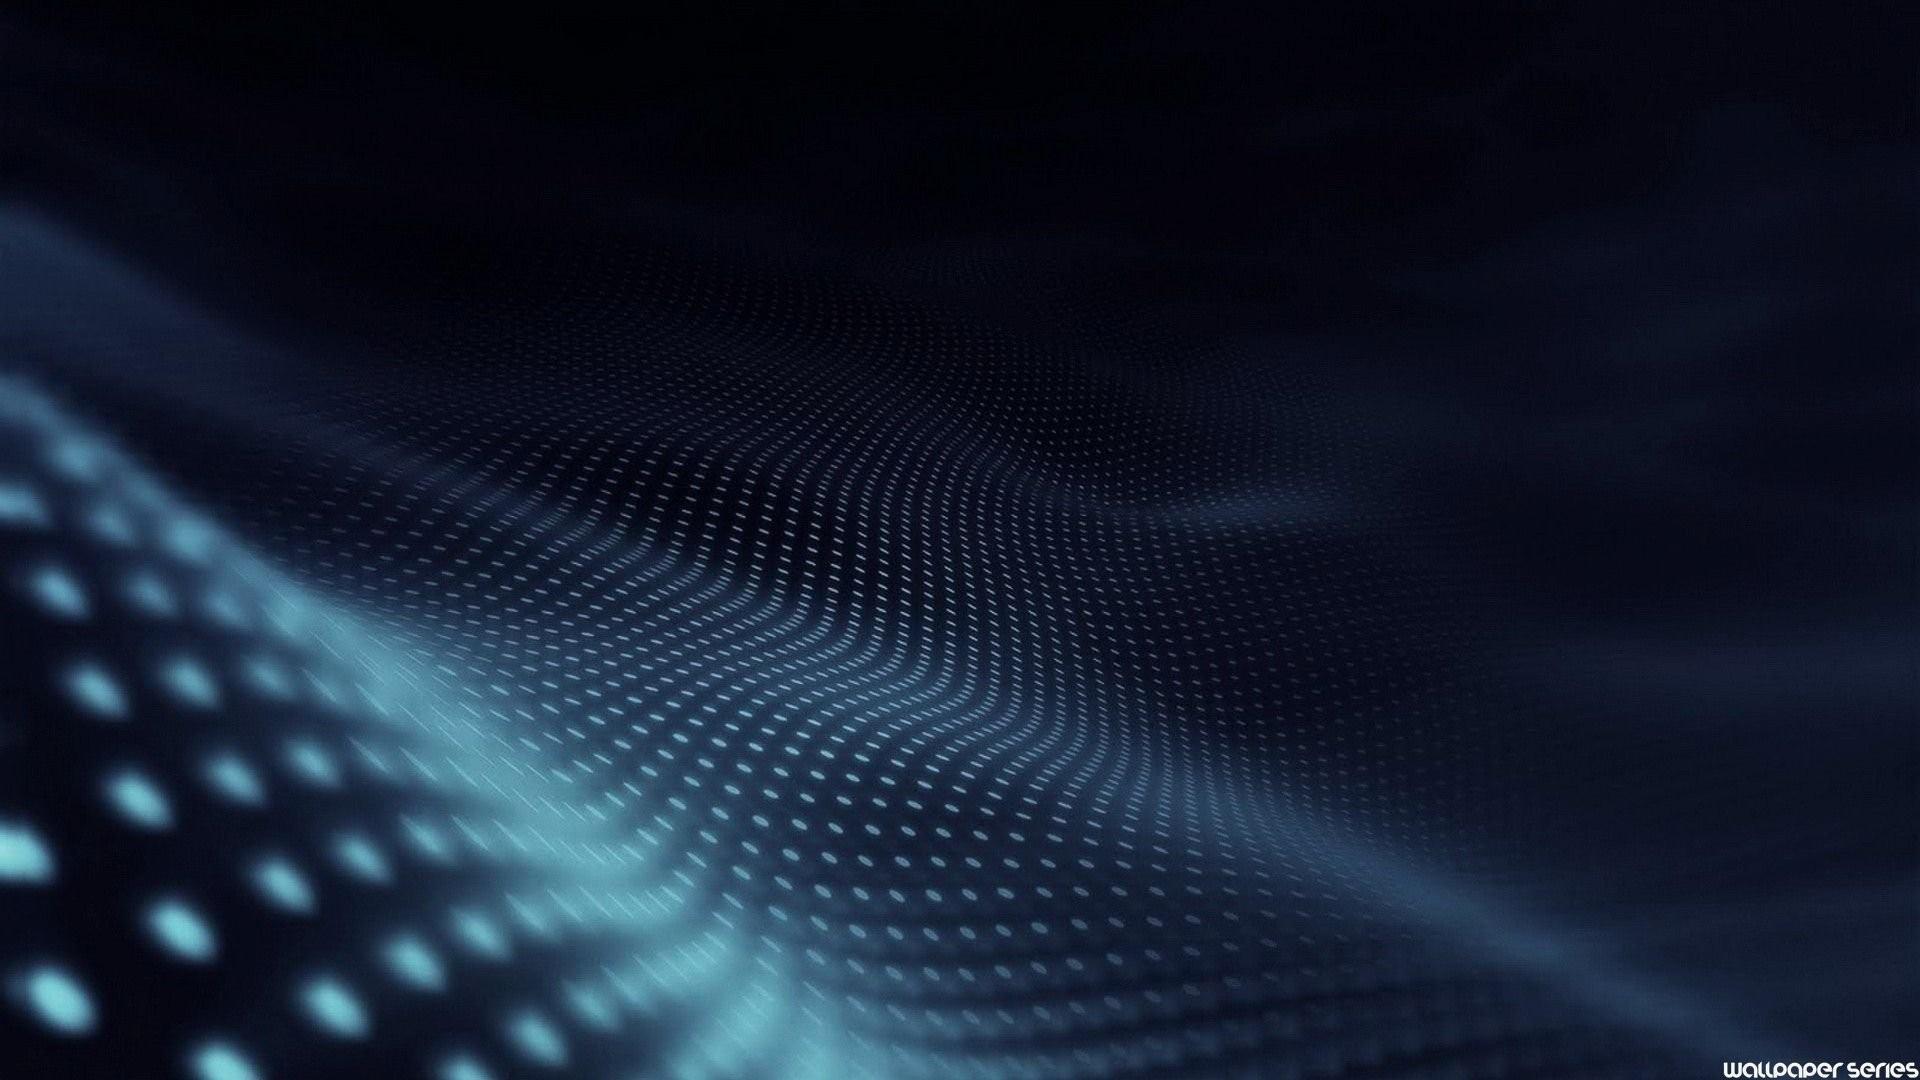 Futuristic Background Blue Background · futuristic background blue  background free powerpoint background